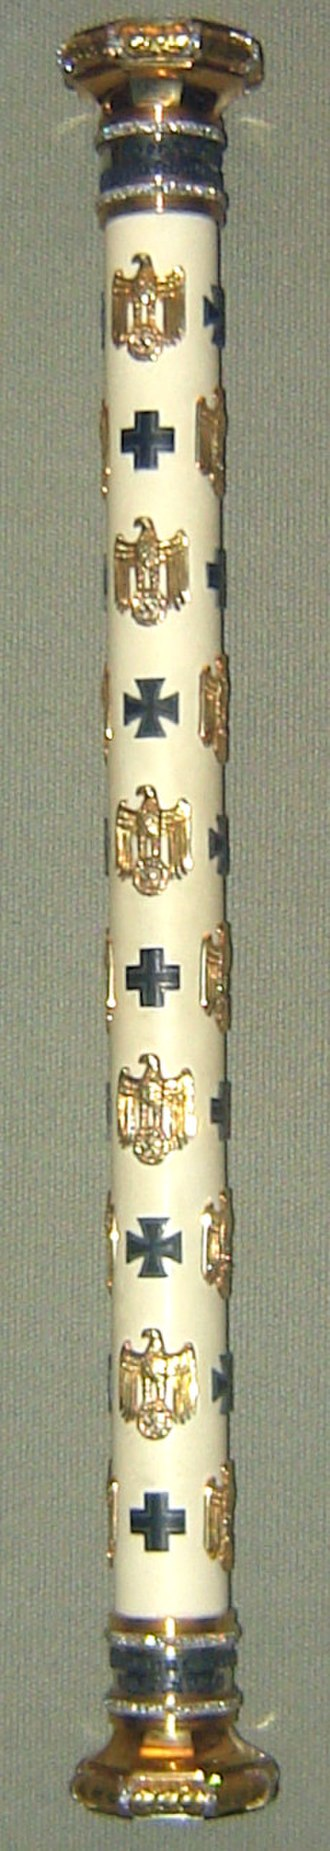 Baton (military) - Image: Goering reichsmarschall baton